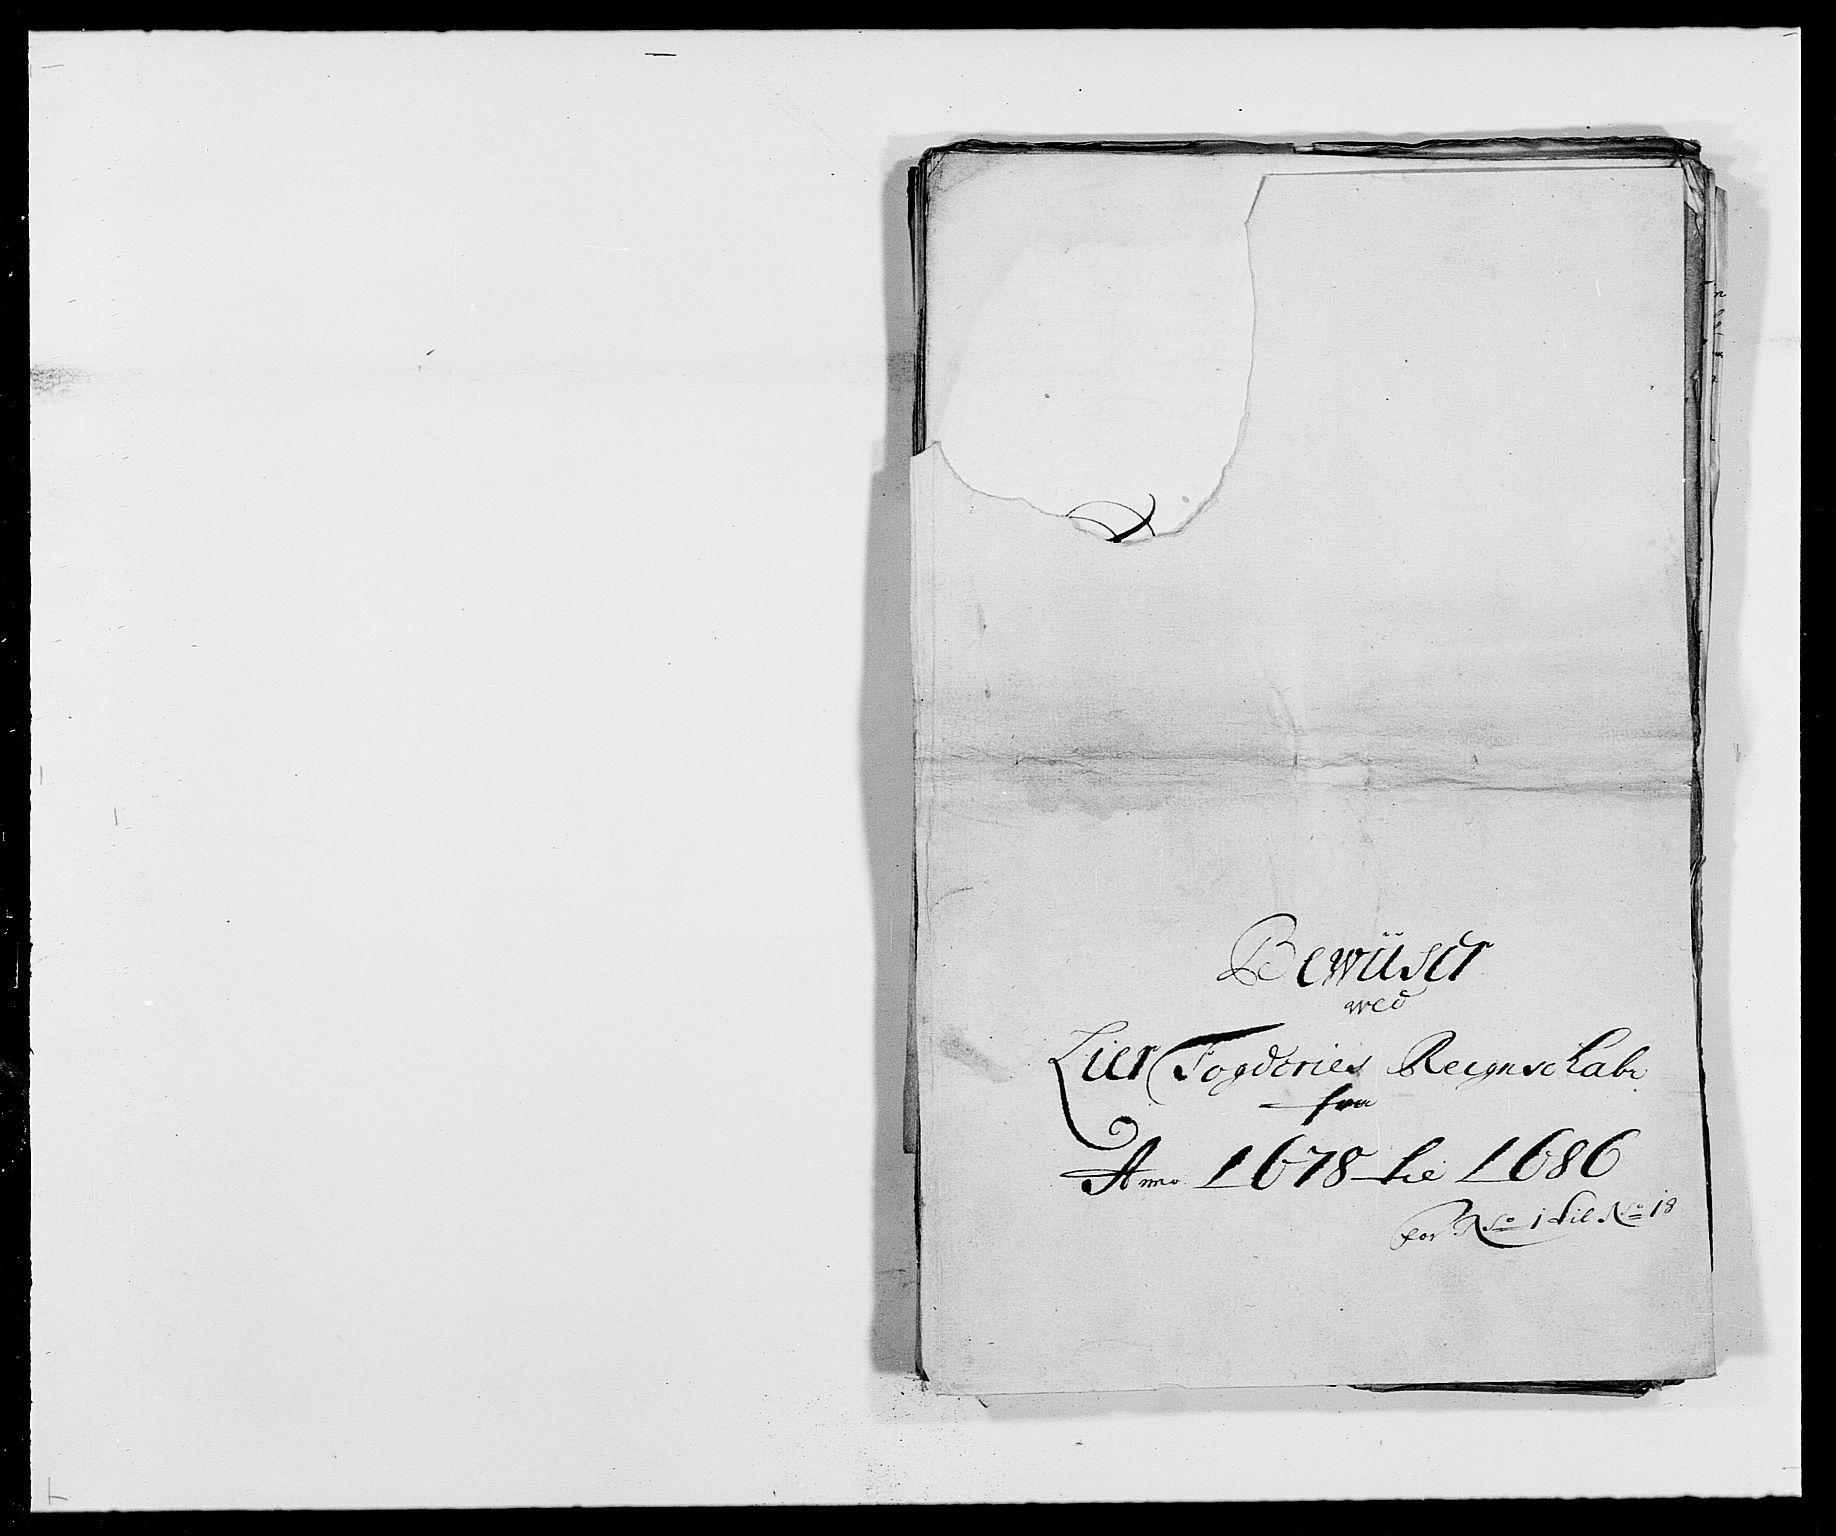 RA, Rentekammeret inntil 1814, Reviderte regnskaper, Fogderegnskap, R27/L1687: Fogderegnskap Lier, 1678-1686, s. 331